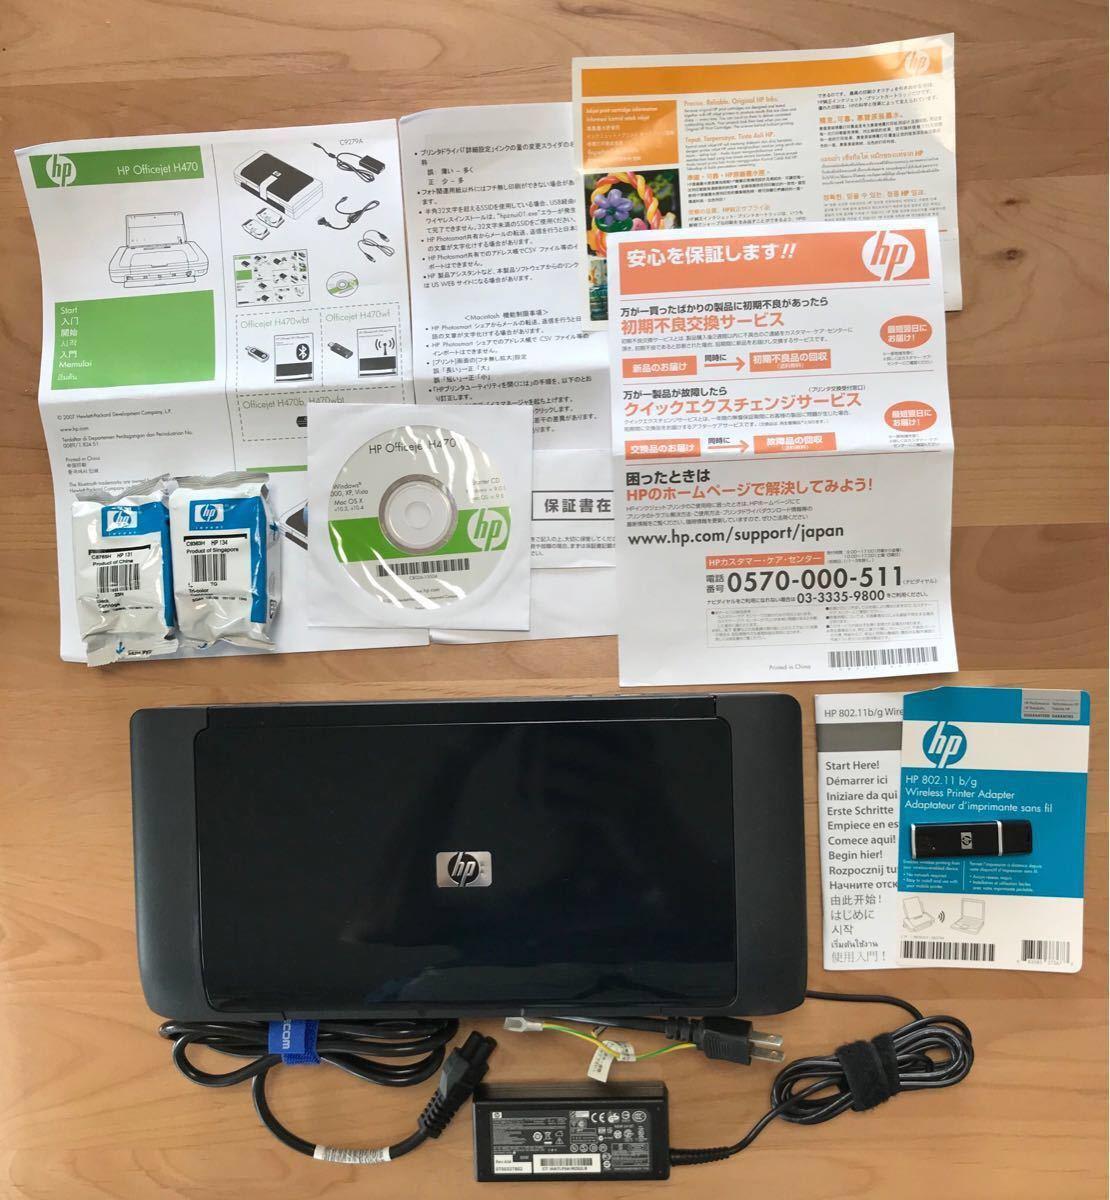 HP Officejet コンパクト モバイル A4 インクジェットプリンタ H470 802.11b/g ワイヤレスLANアダプタ付き_画像2